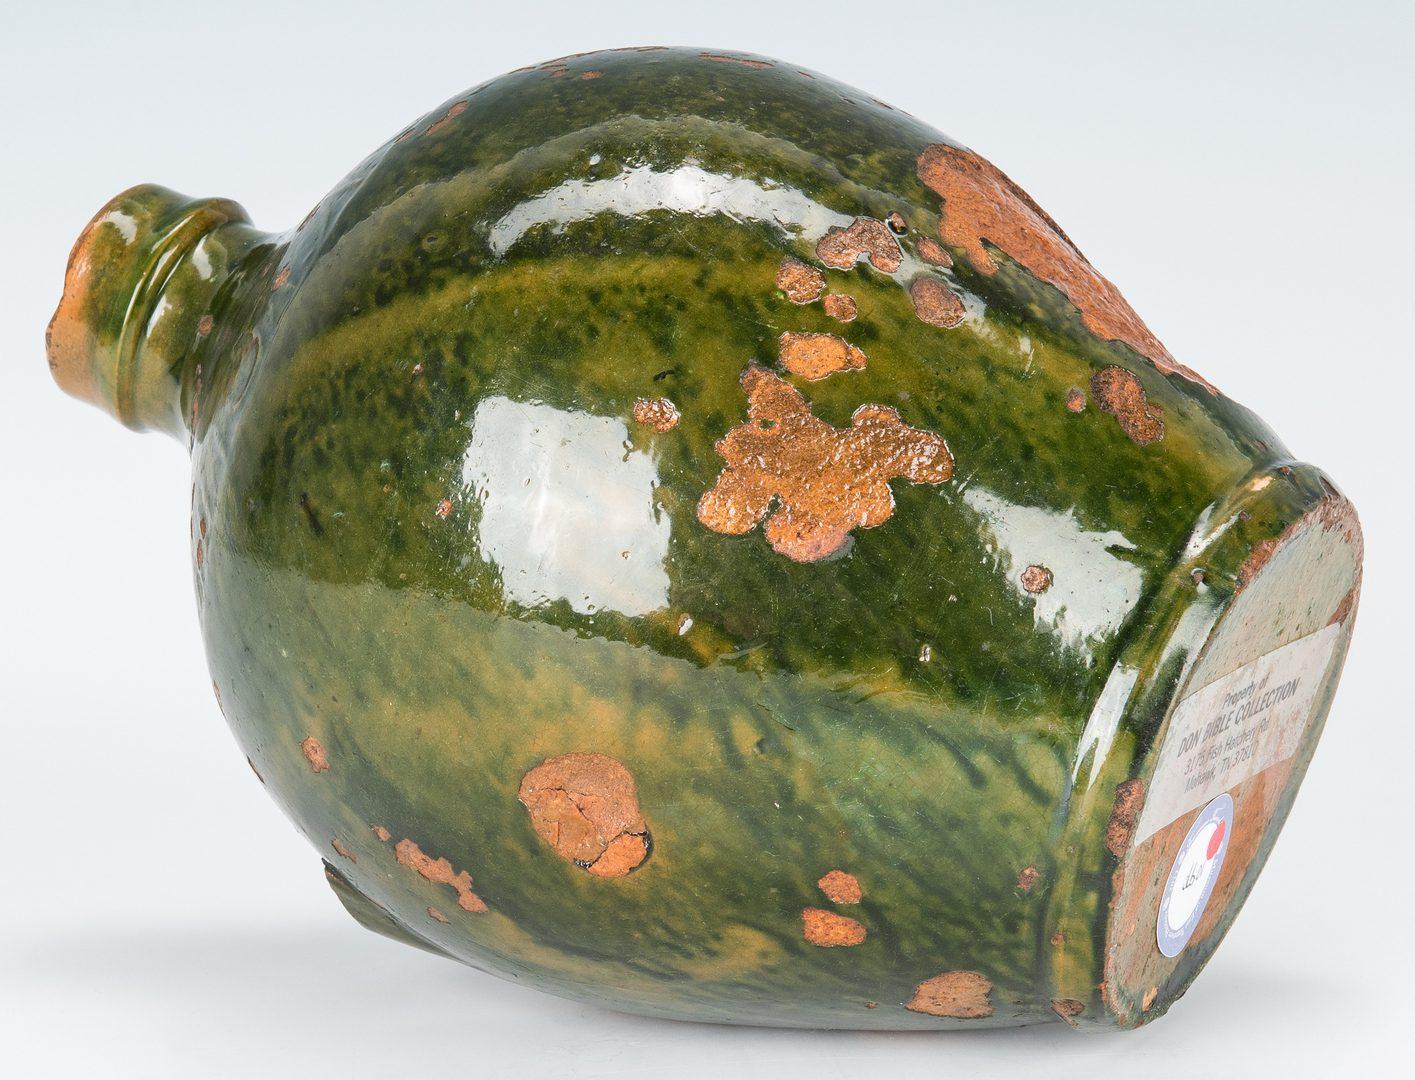 Lot 156: C A Haun Redware Pottery Jug, Greene County, TN